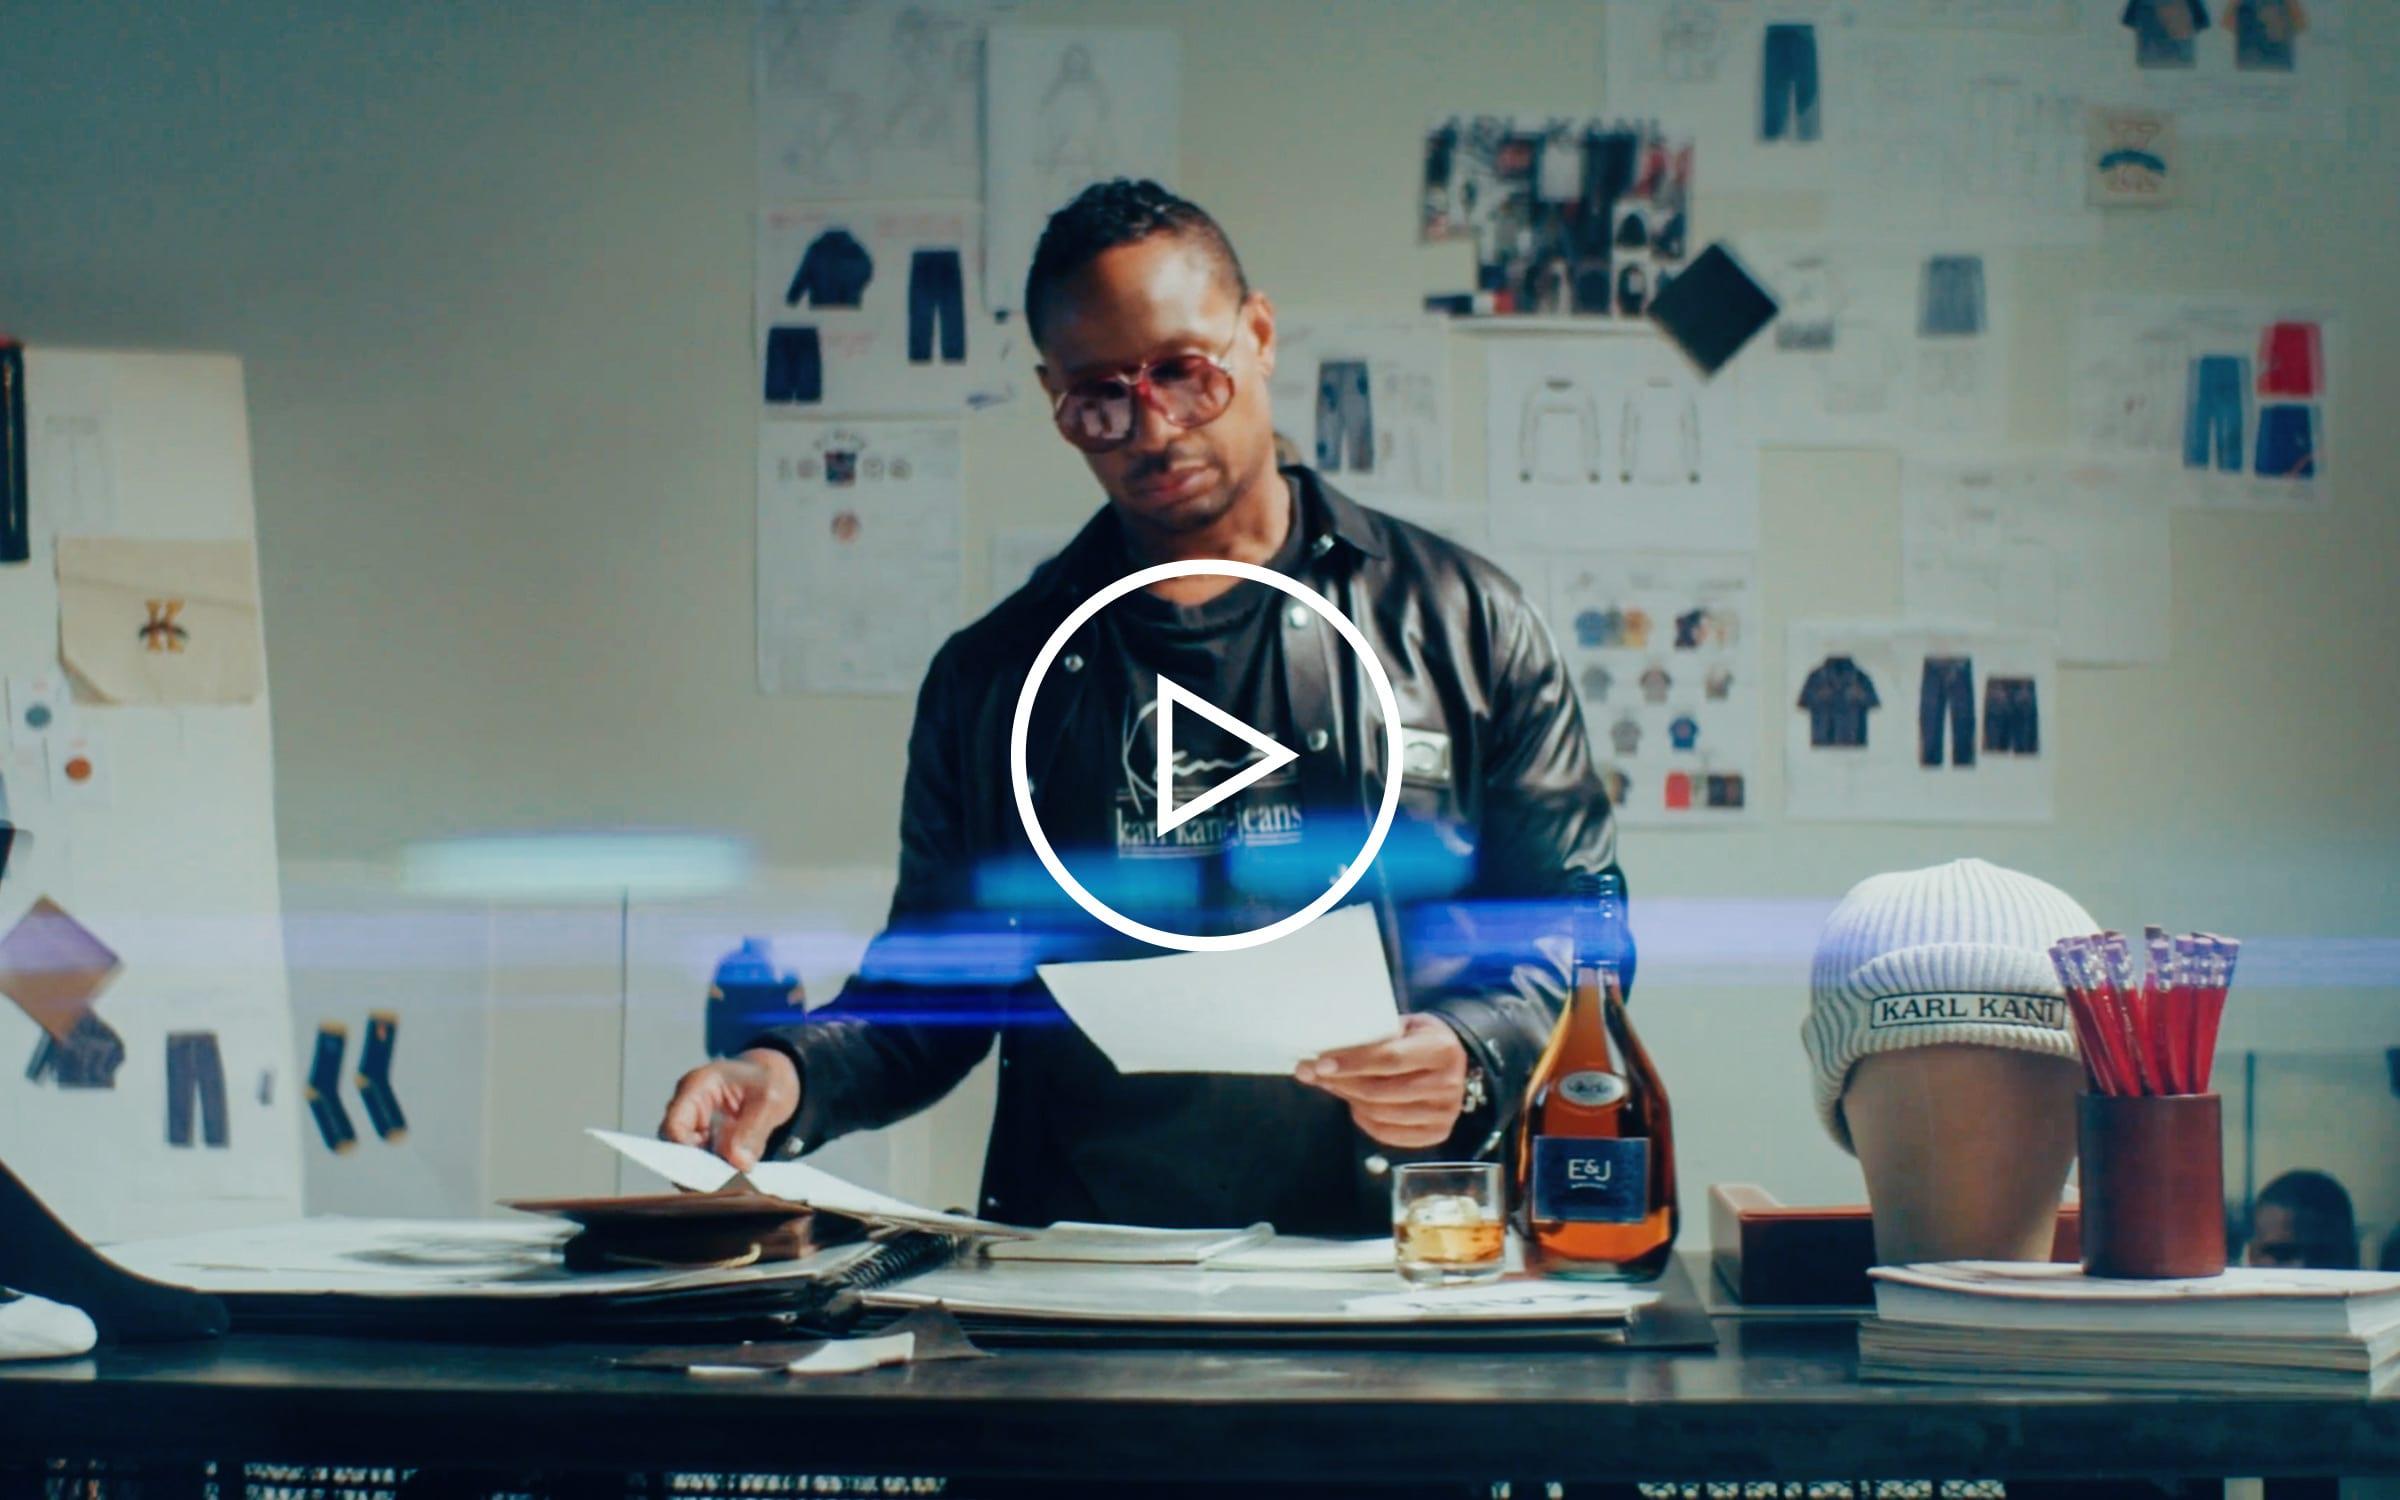 EJ KarlKani LegacySeries Thumnail Video3